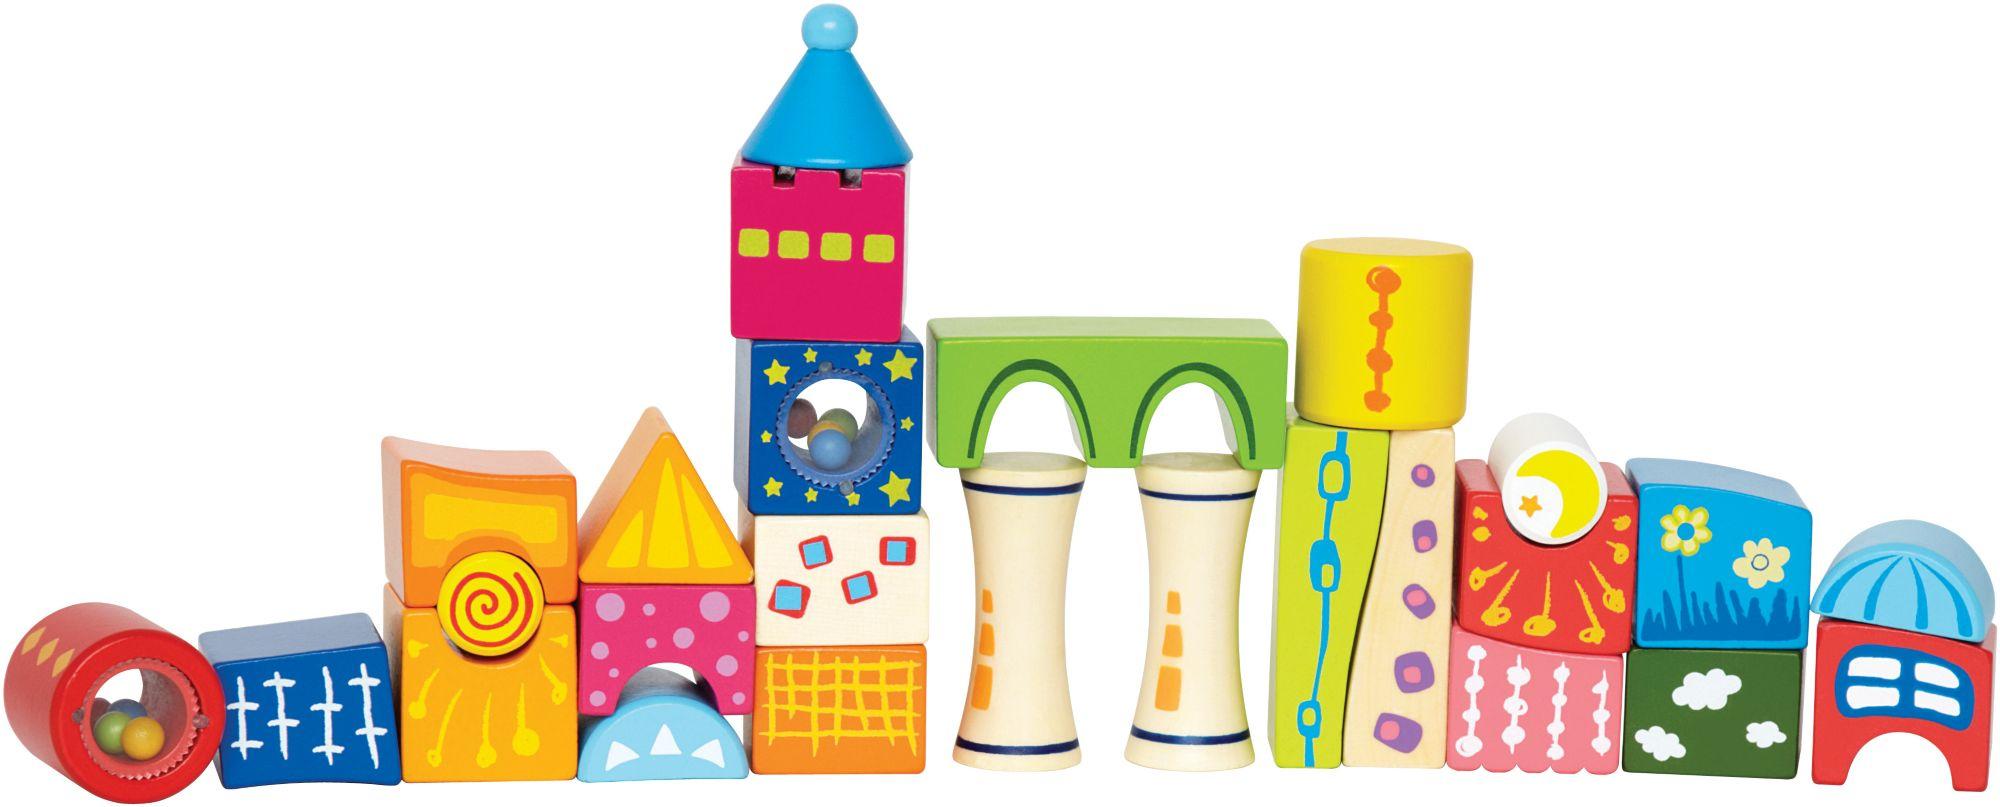 HAPE Hape Bausteineset, »Fantasiebausteine Schloss«